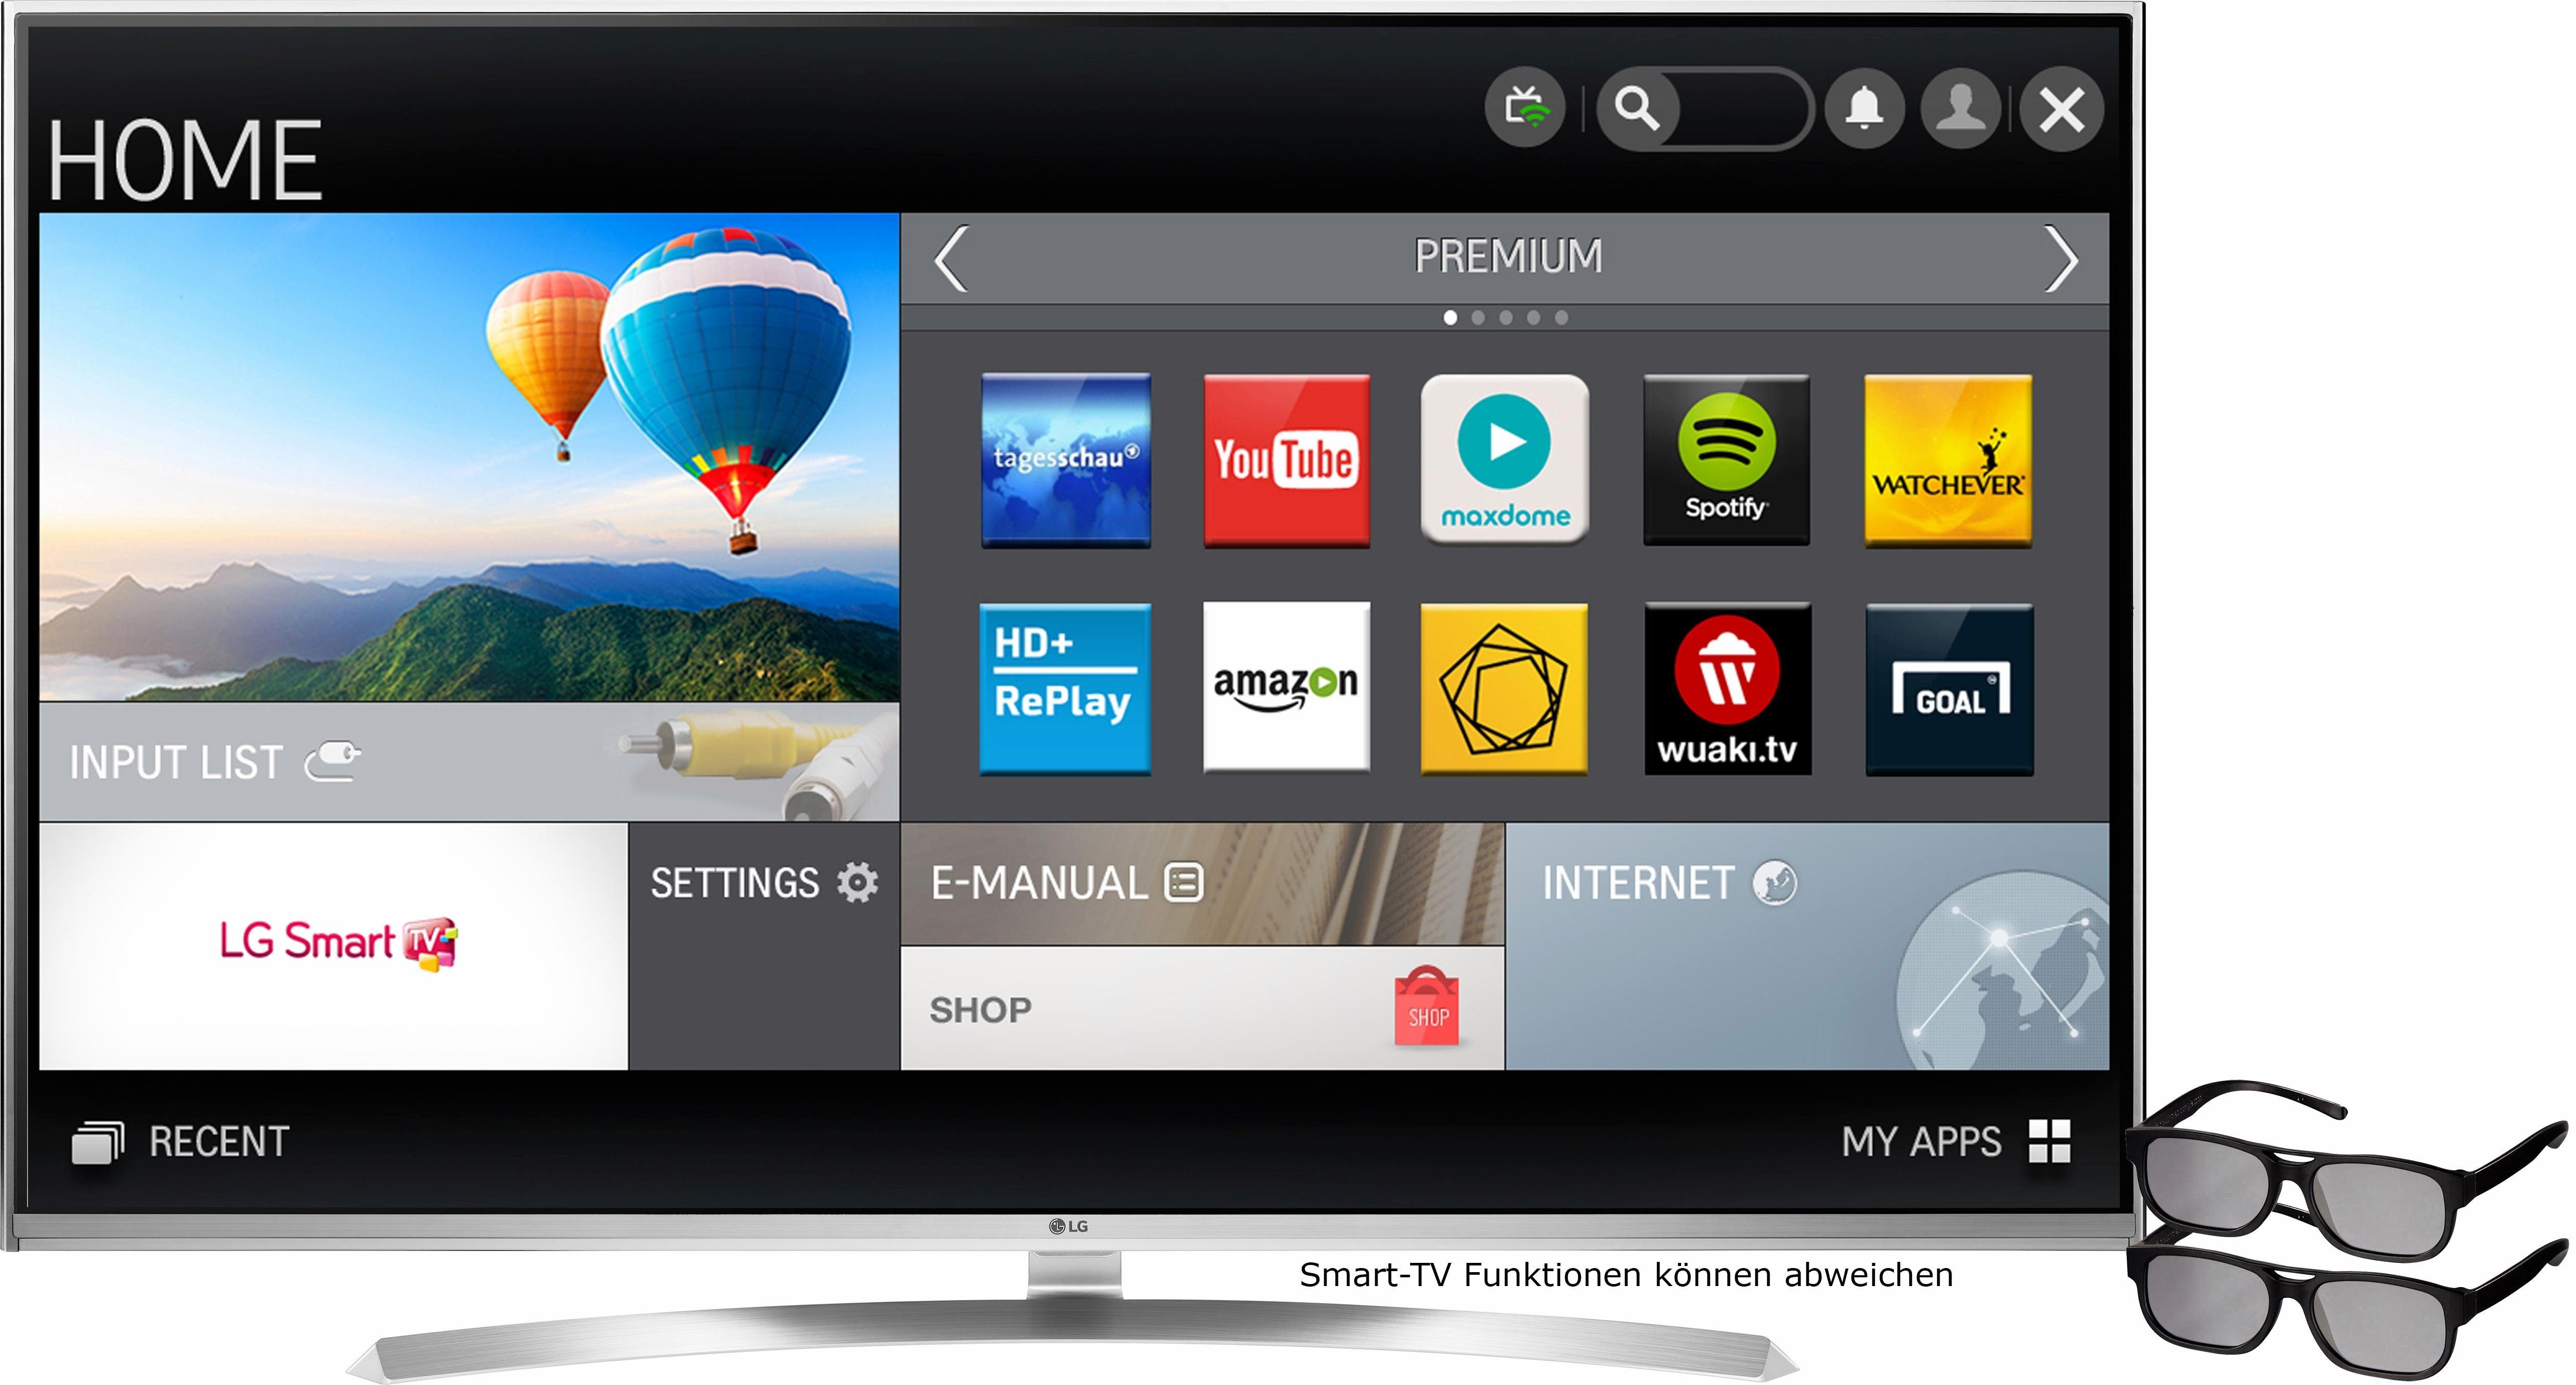 LG 49UH8509, LED Fernseher, 123 cm (49 Zoll), 2160p (4K Ultra HD), Smart-TV